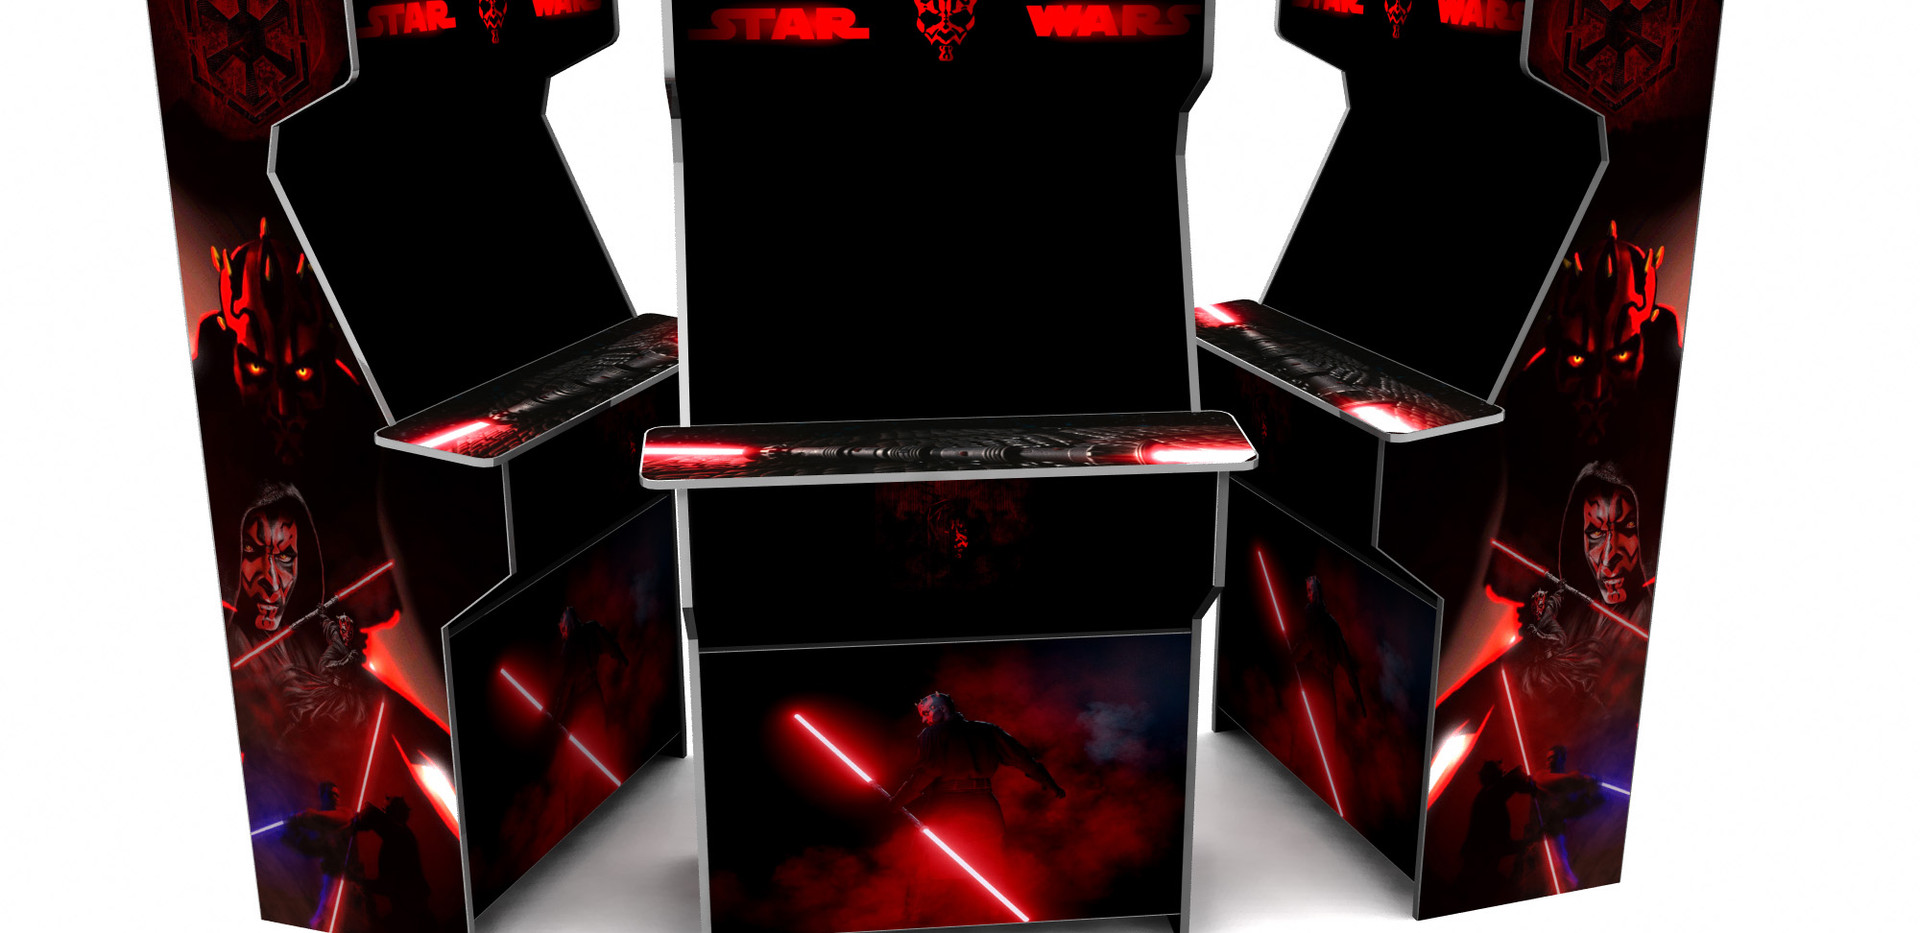 Sith Lord Arcade